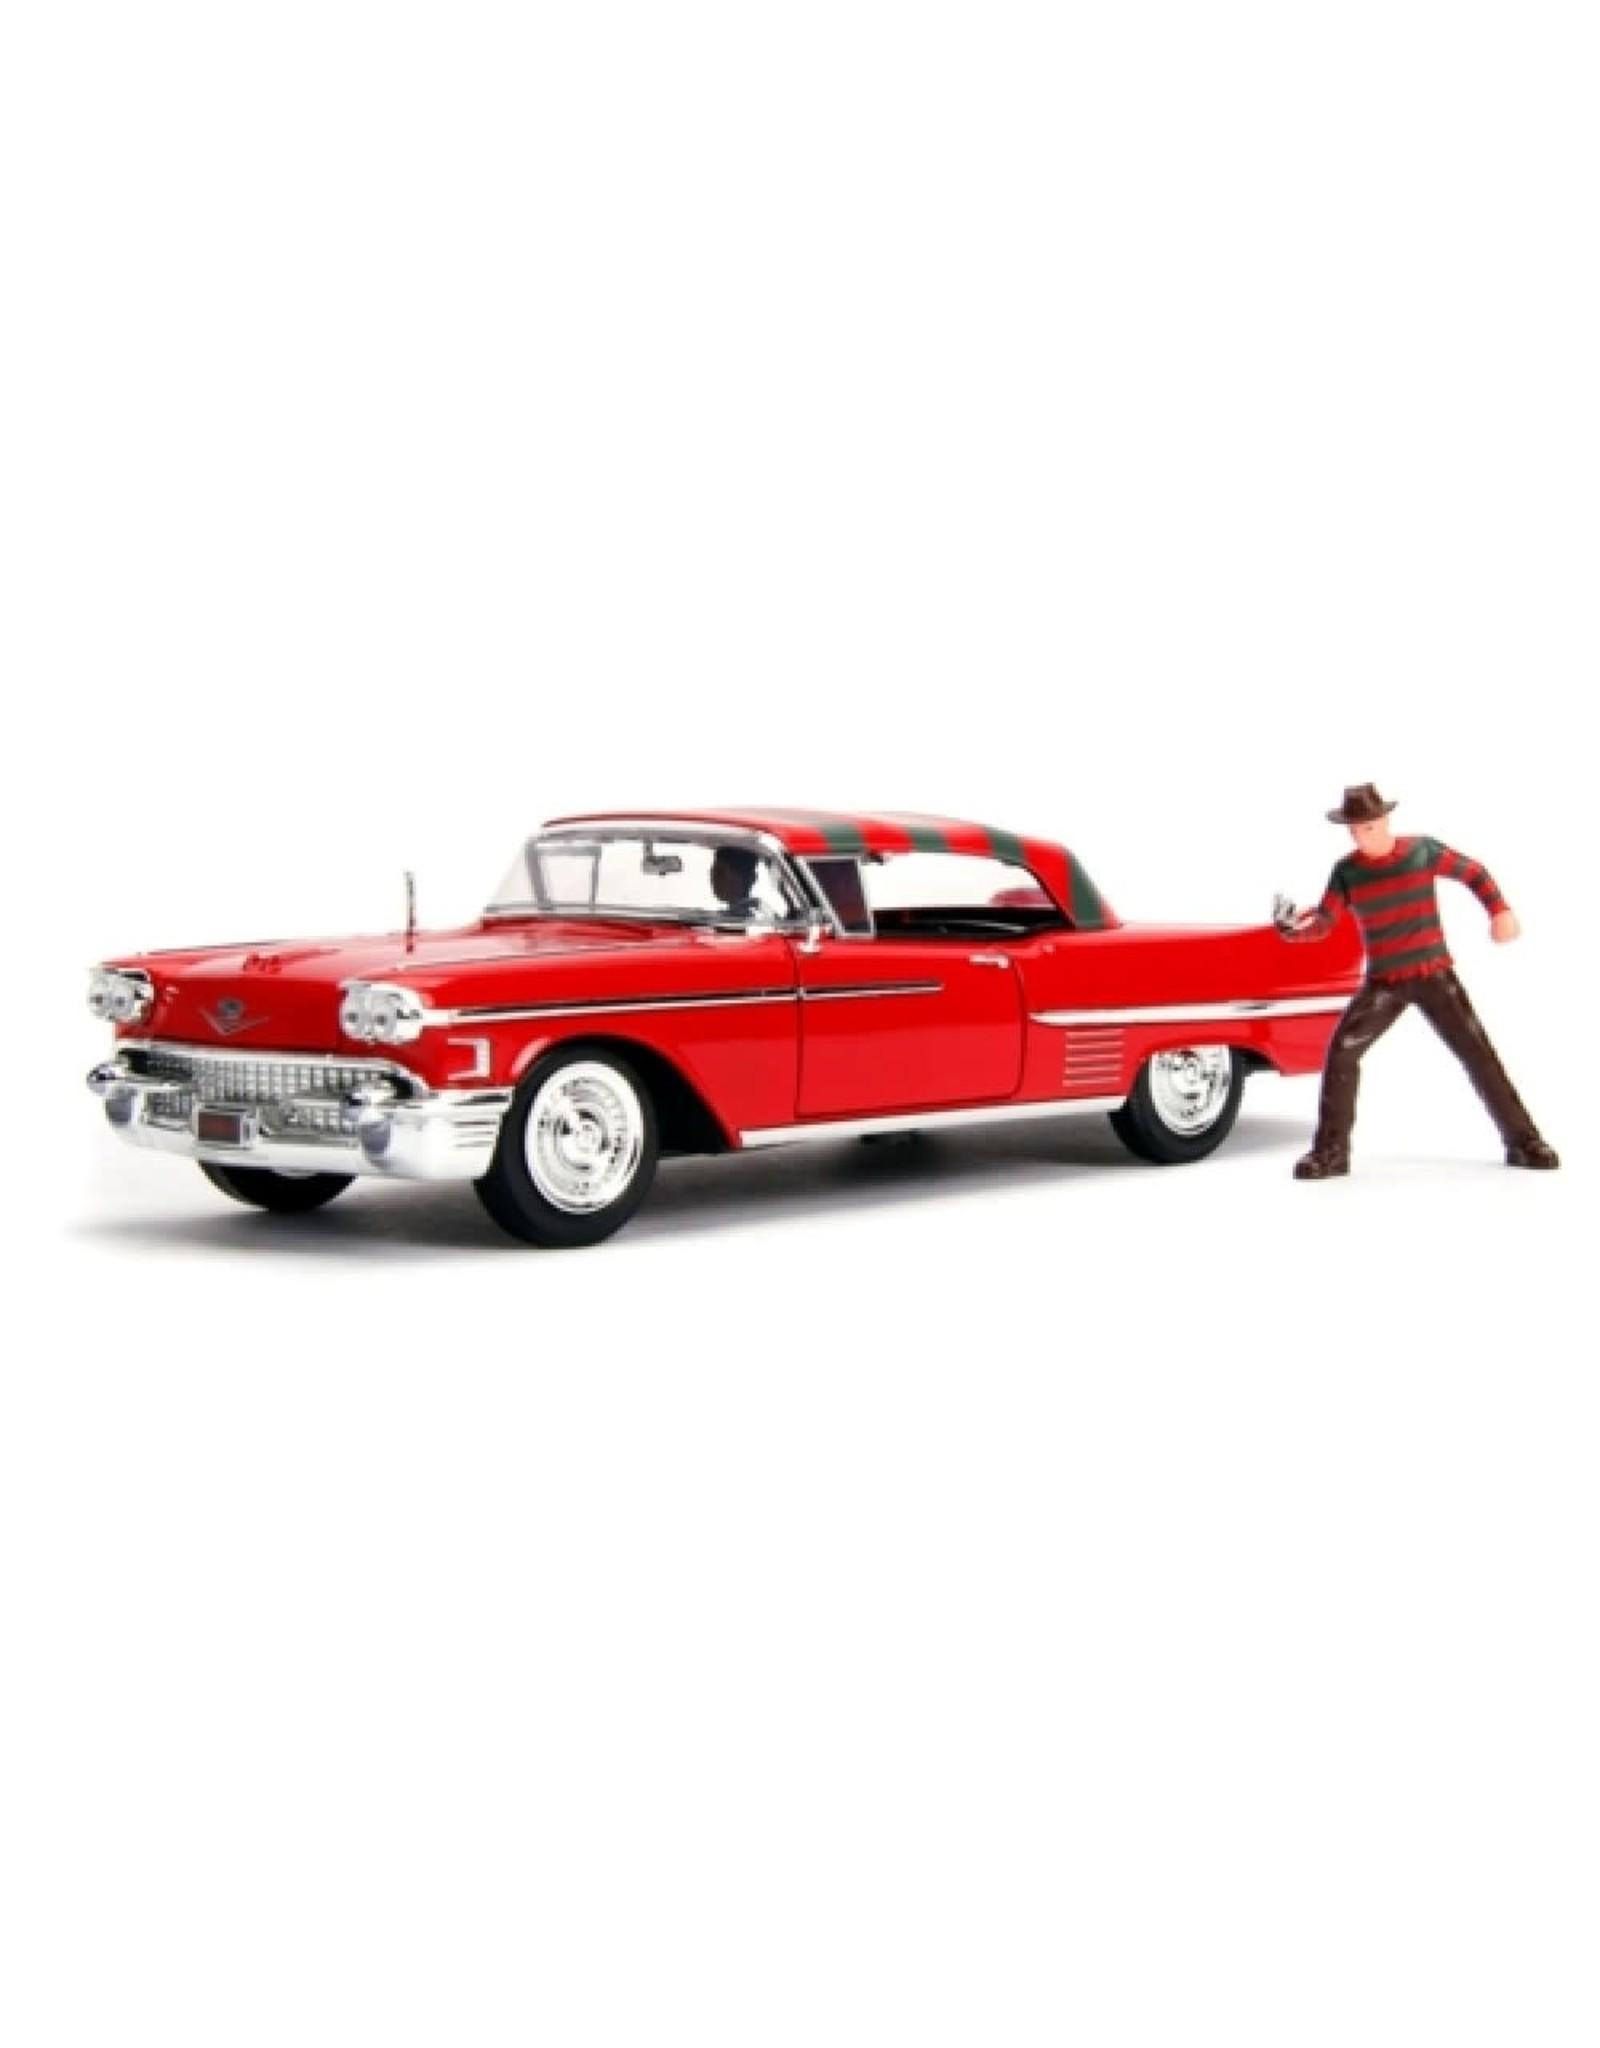 Jada Freddy Krueger & 1958 Cadillac Series 62